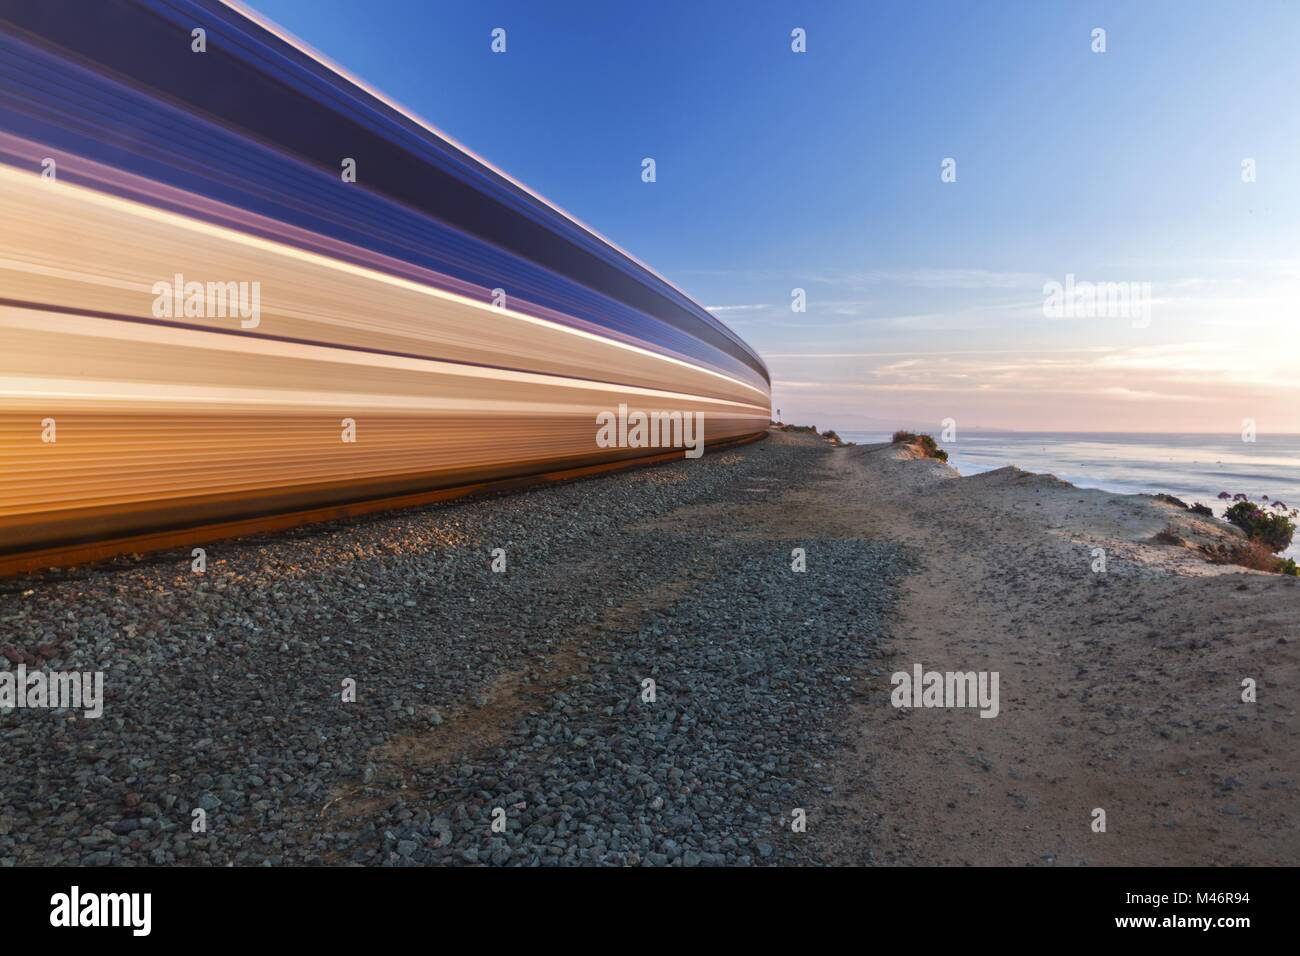 high-speed-blurred-train-passing-through